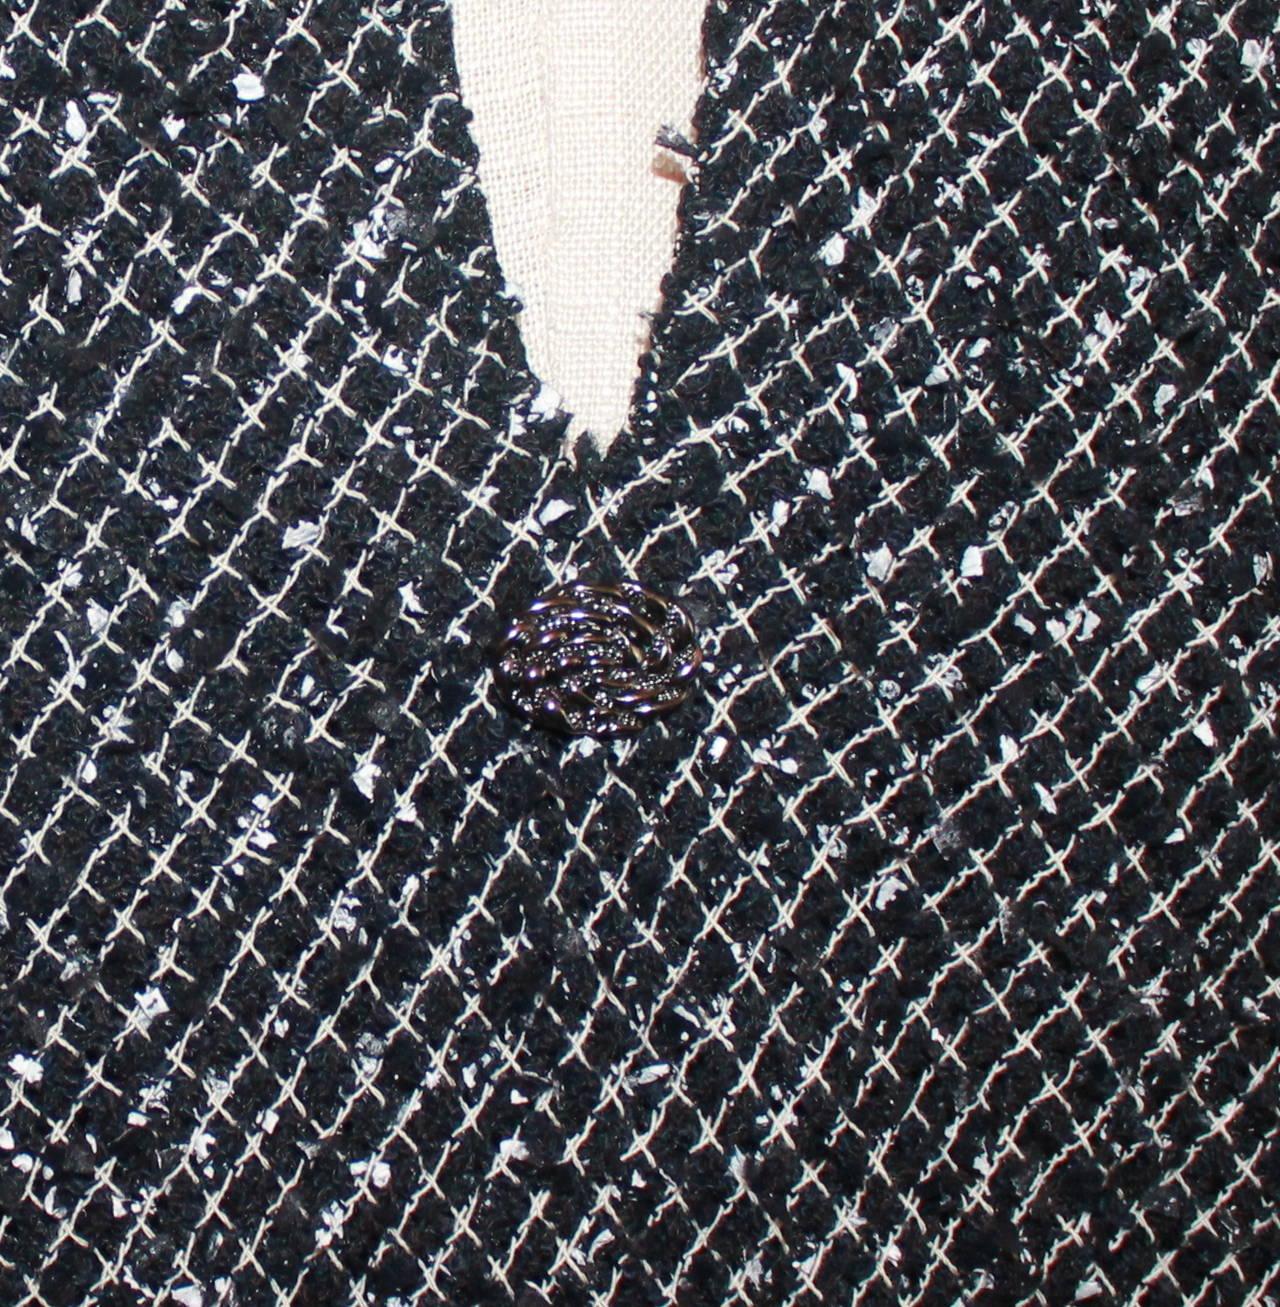 Chanel Black & White Tweed High-Low Dress - 38 4